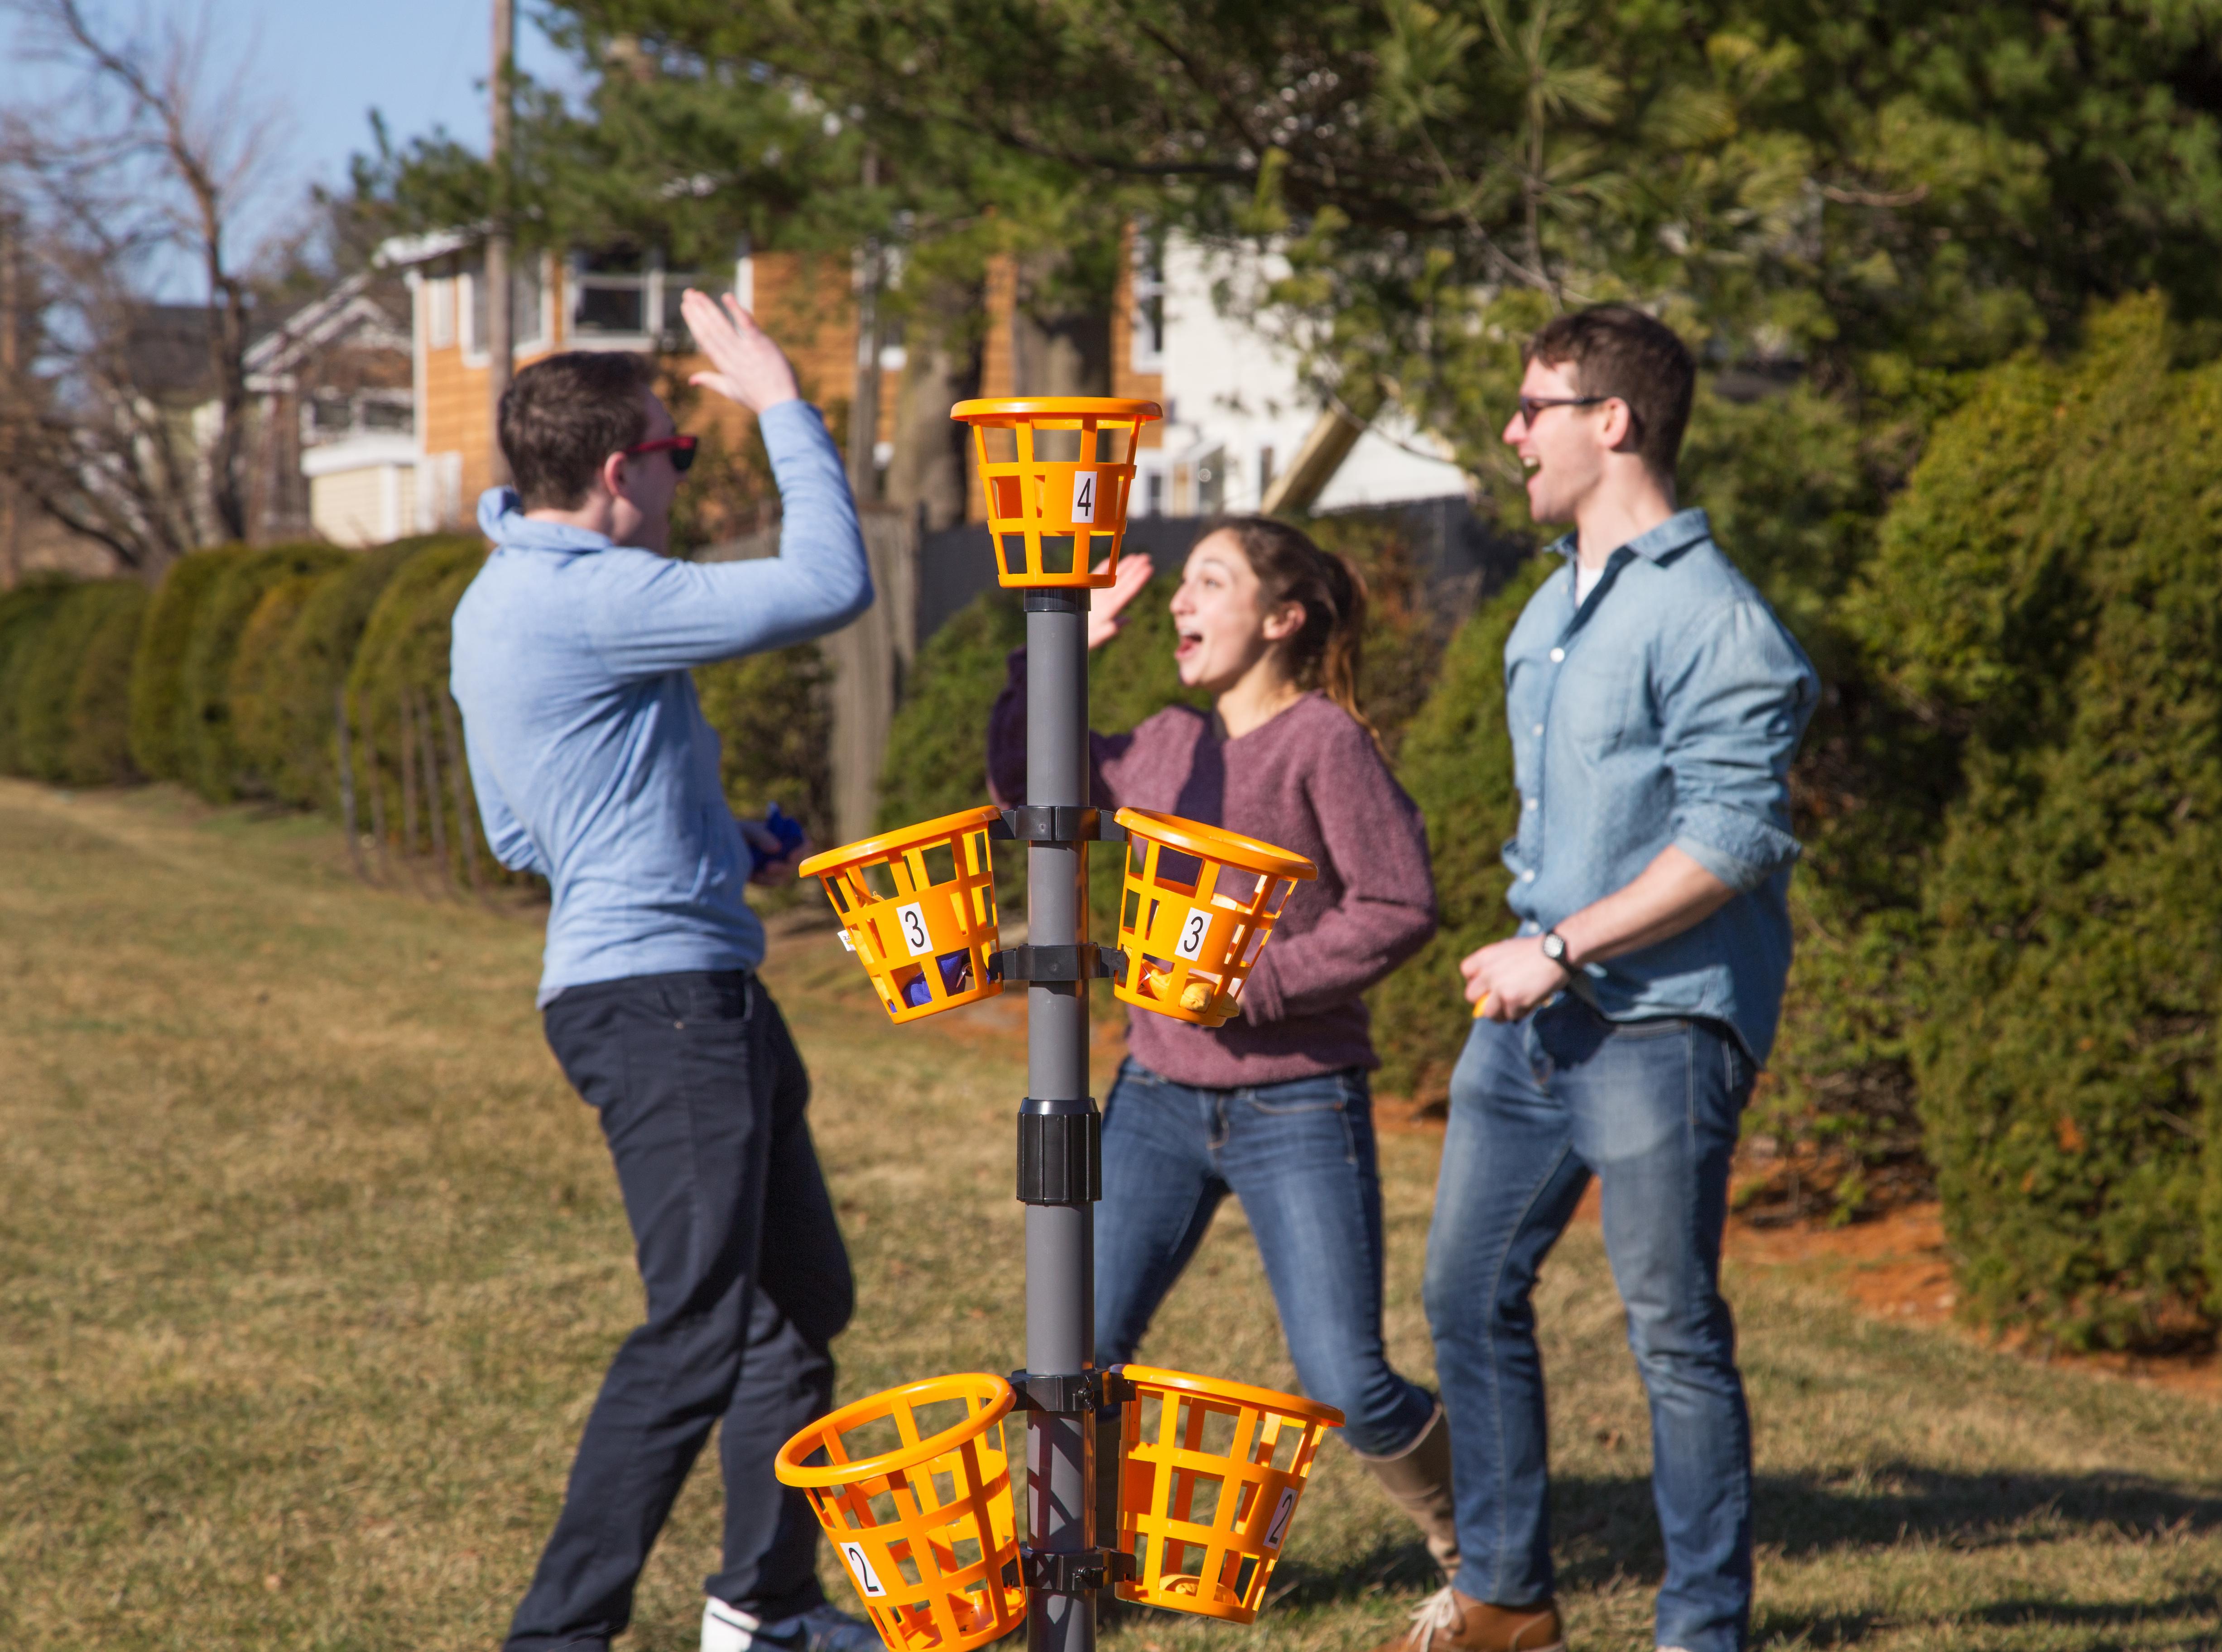 Three people play bean bag basket game in a yard.